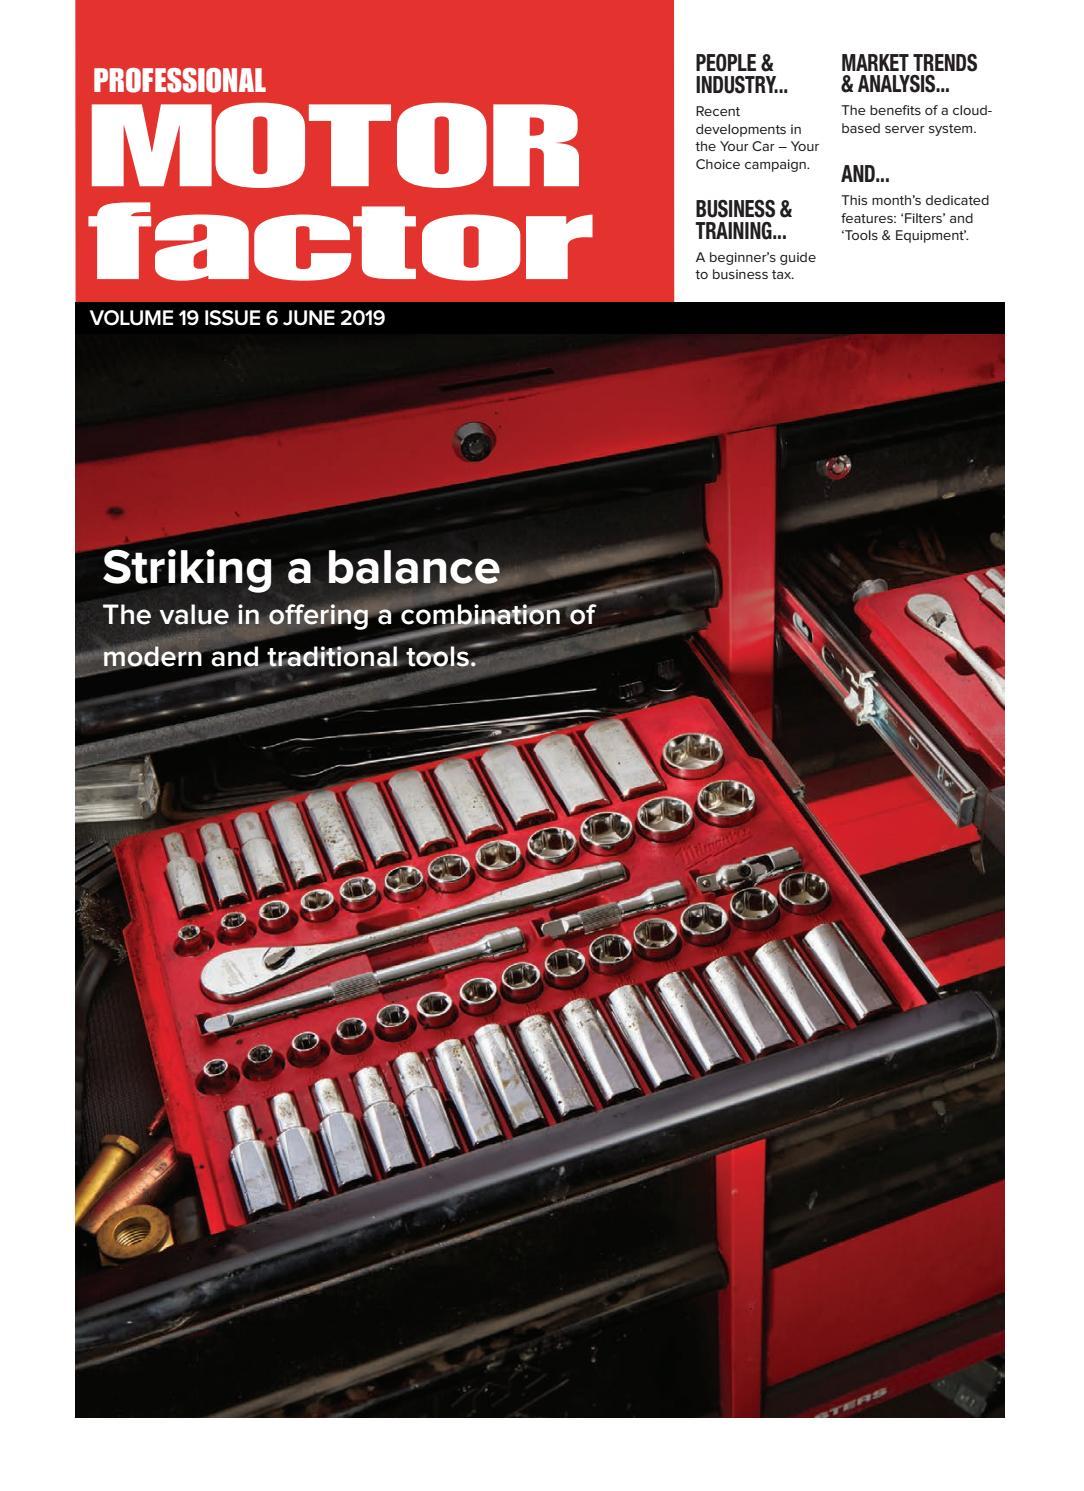 Professional Motor Factor June 2019 by Hamerville Media Group - issuu